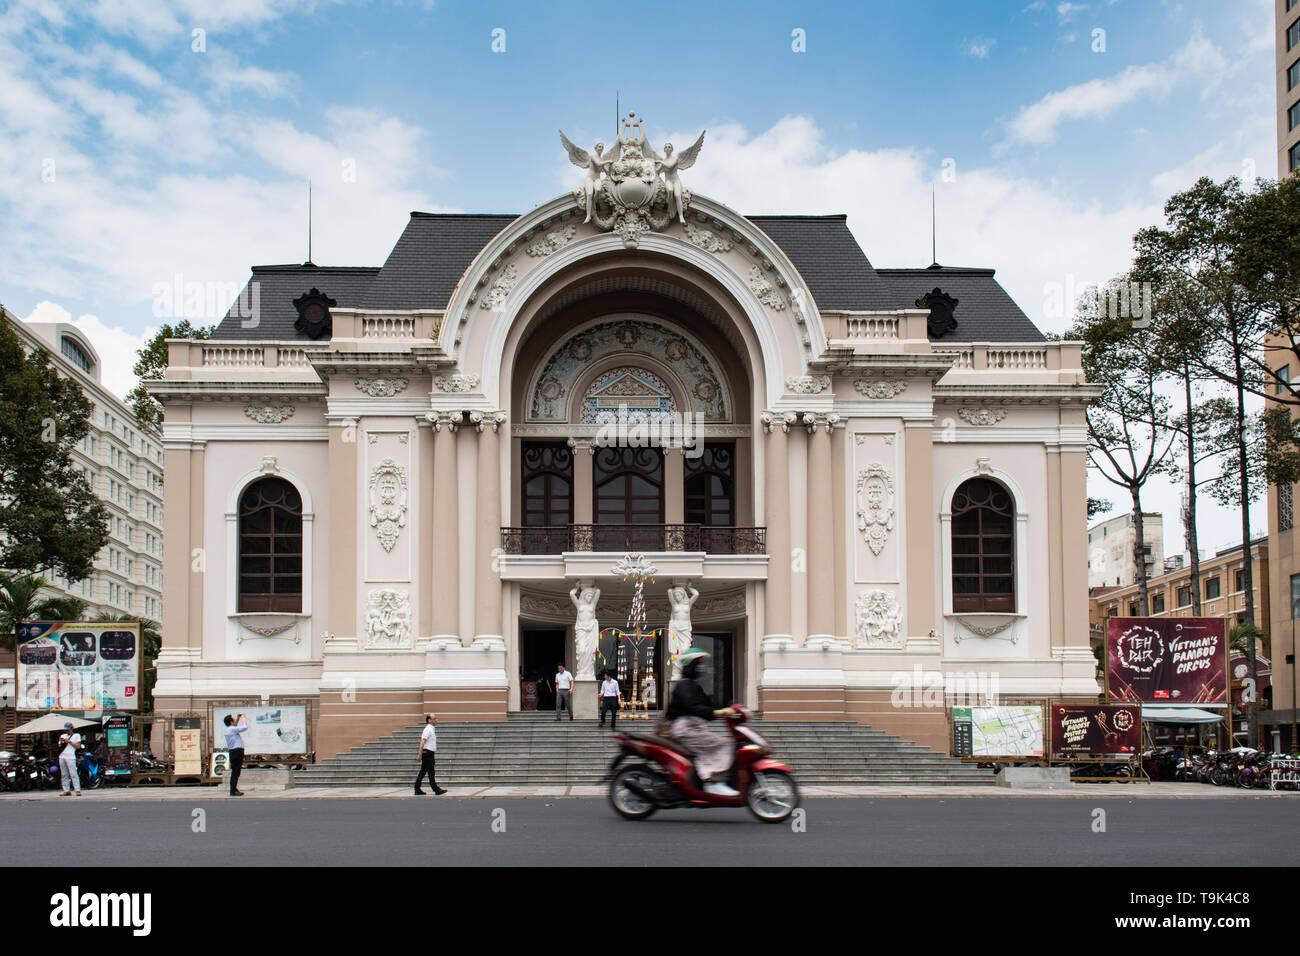 Ho Chi Minh, Vietnam - marzo 20th, 2019 - Saigon Opera House (Ho Chi Minh Municipal Theater) construido en 1897 por el arquitecto francés Eugène hurón. Imagen De Stock